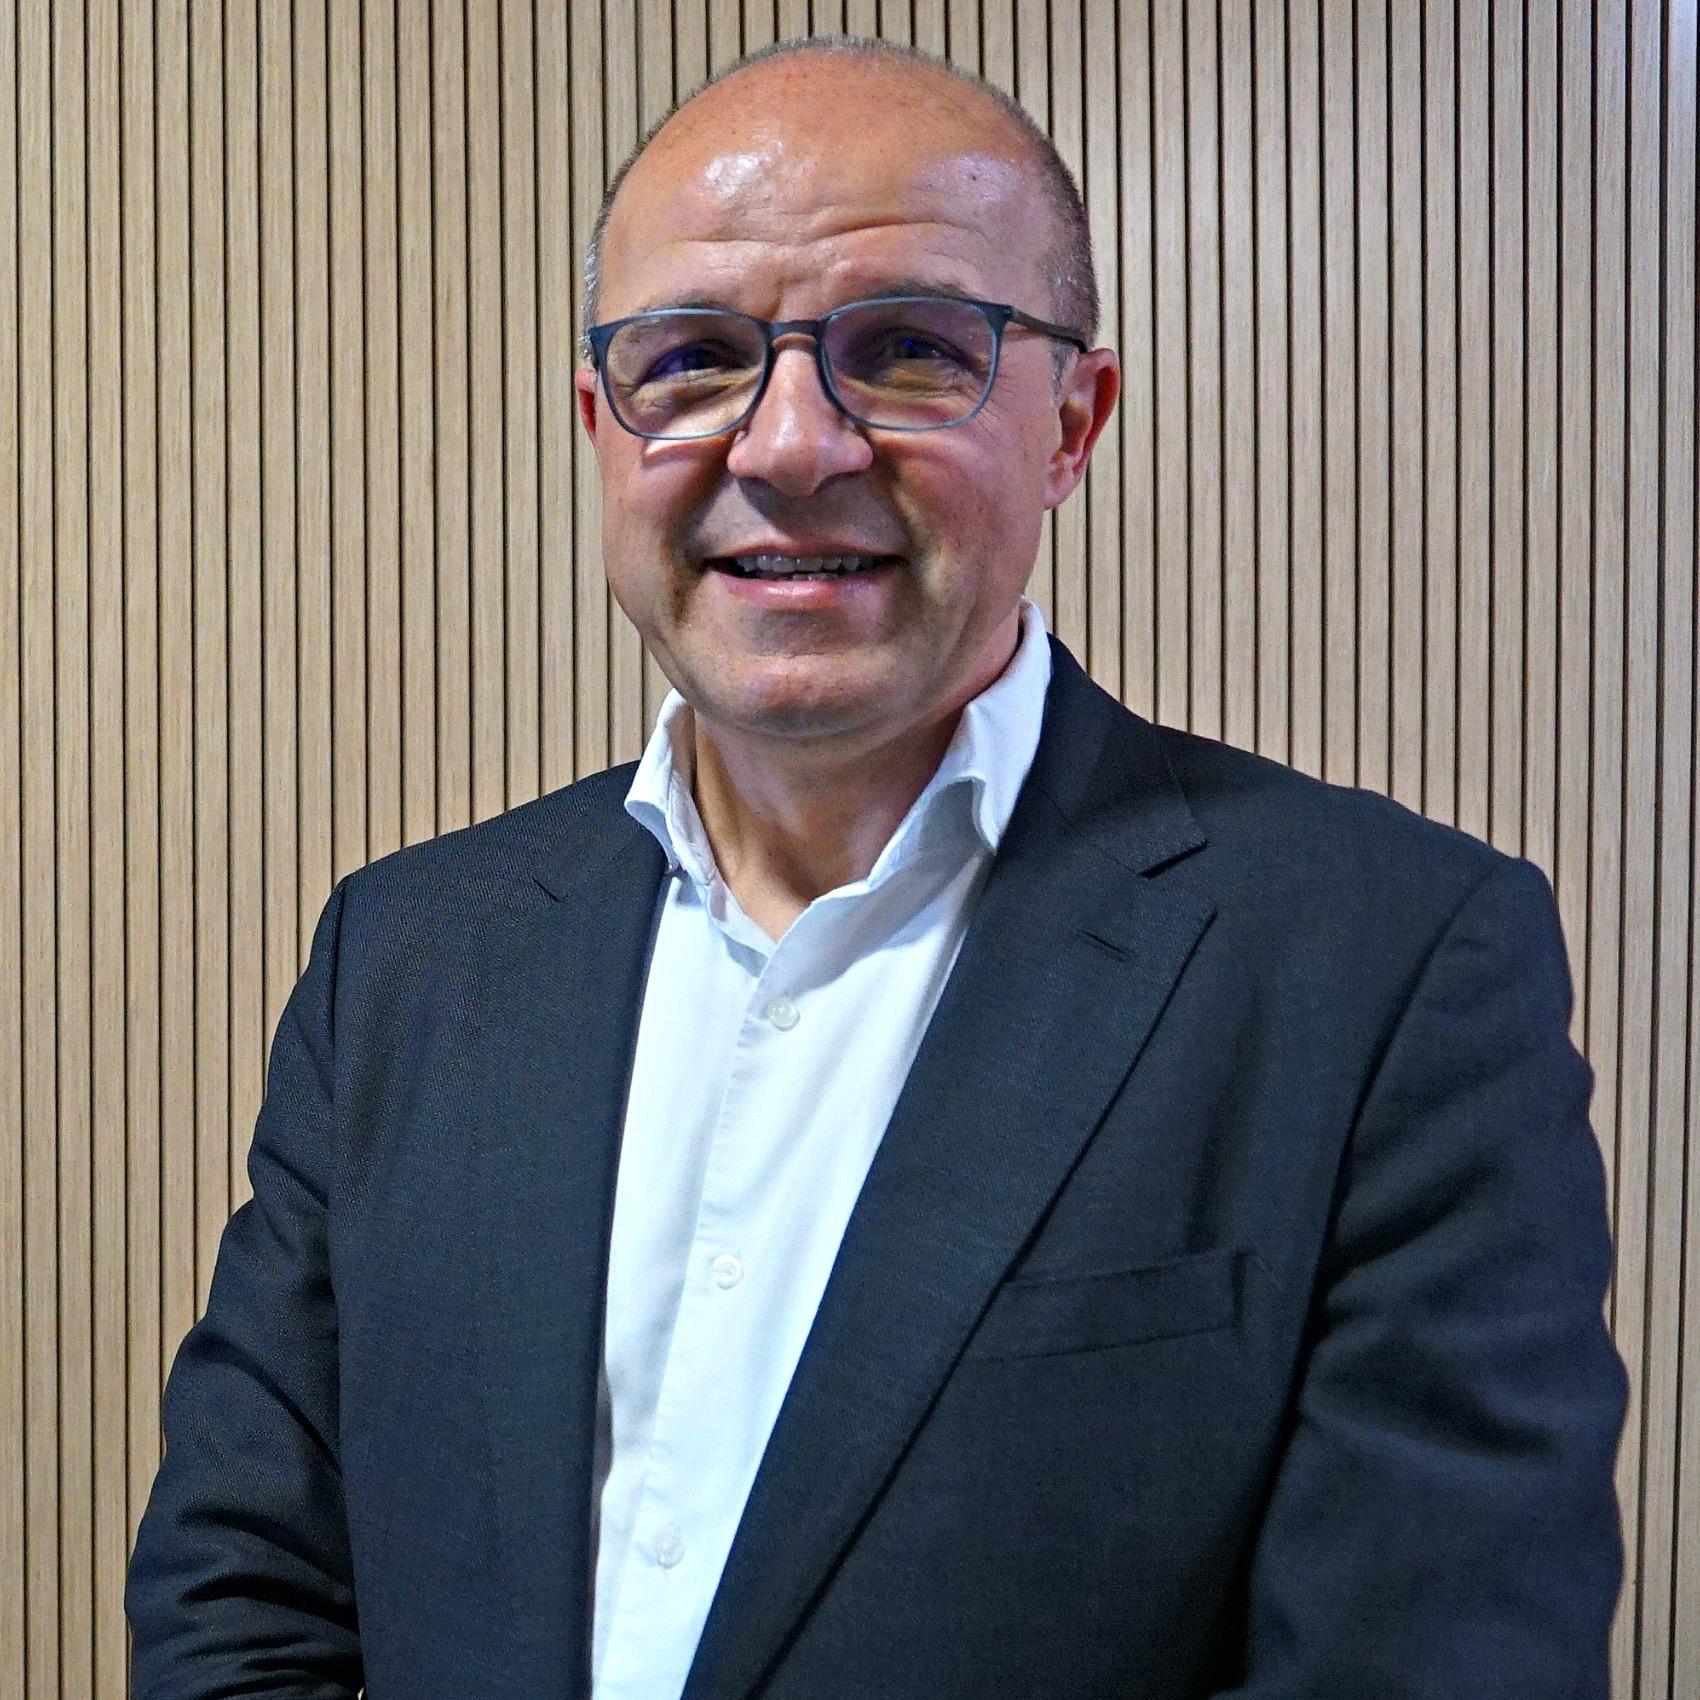 Dr. Josep-Anton Feliu